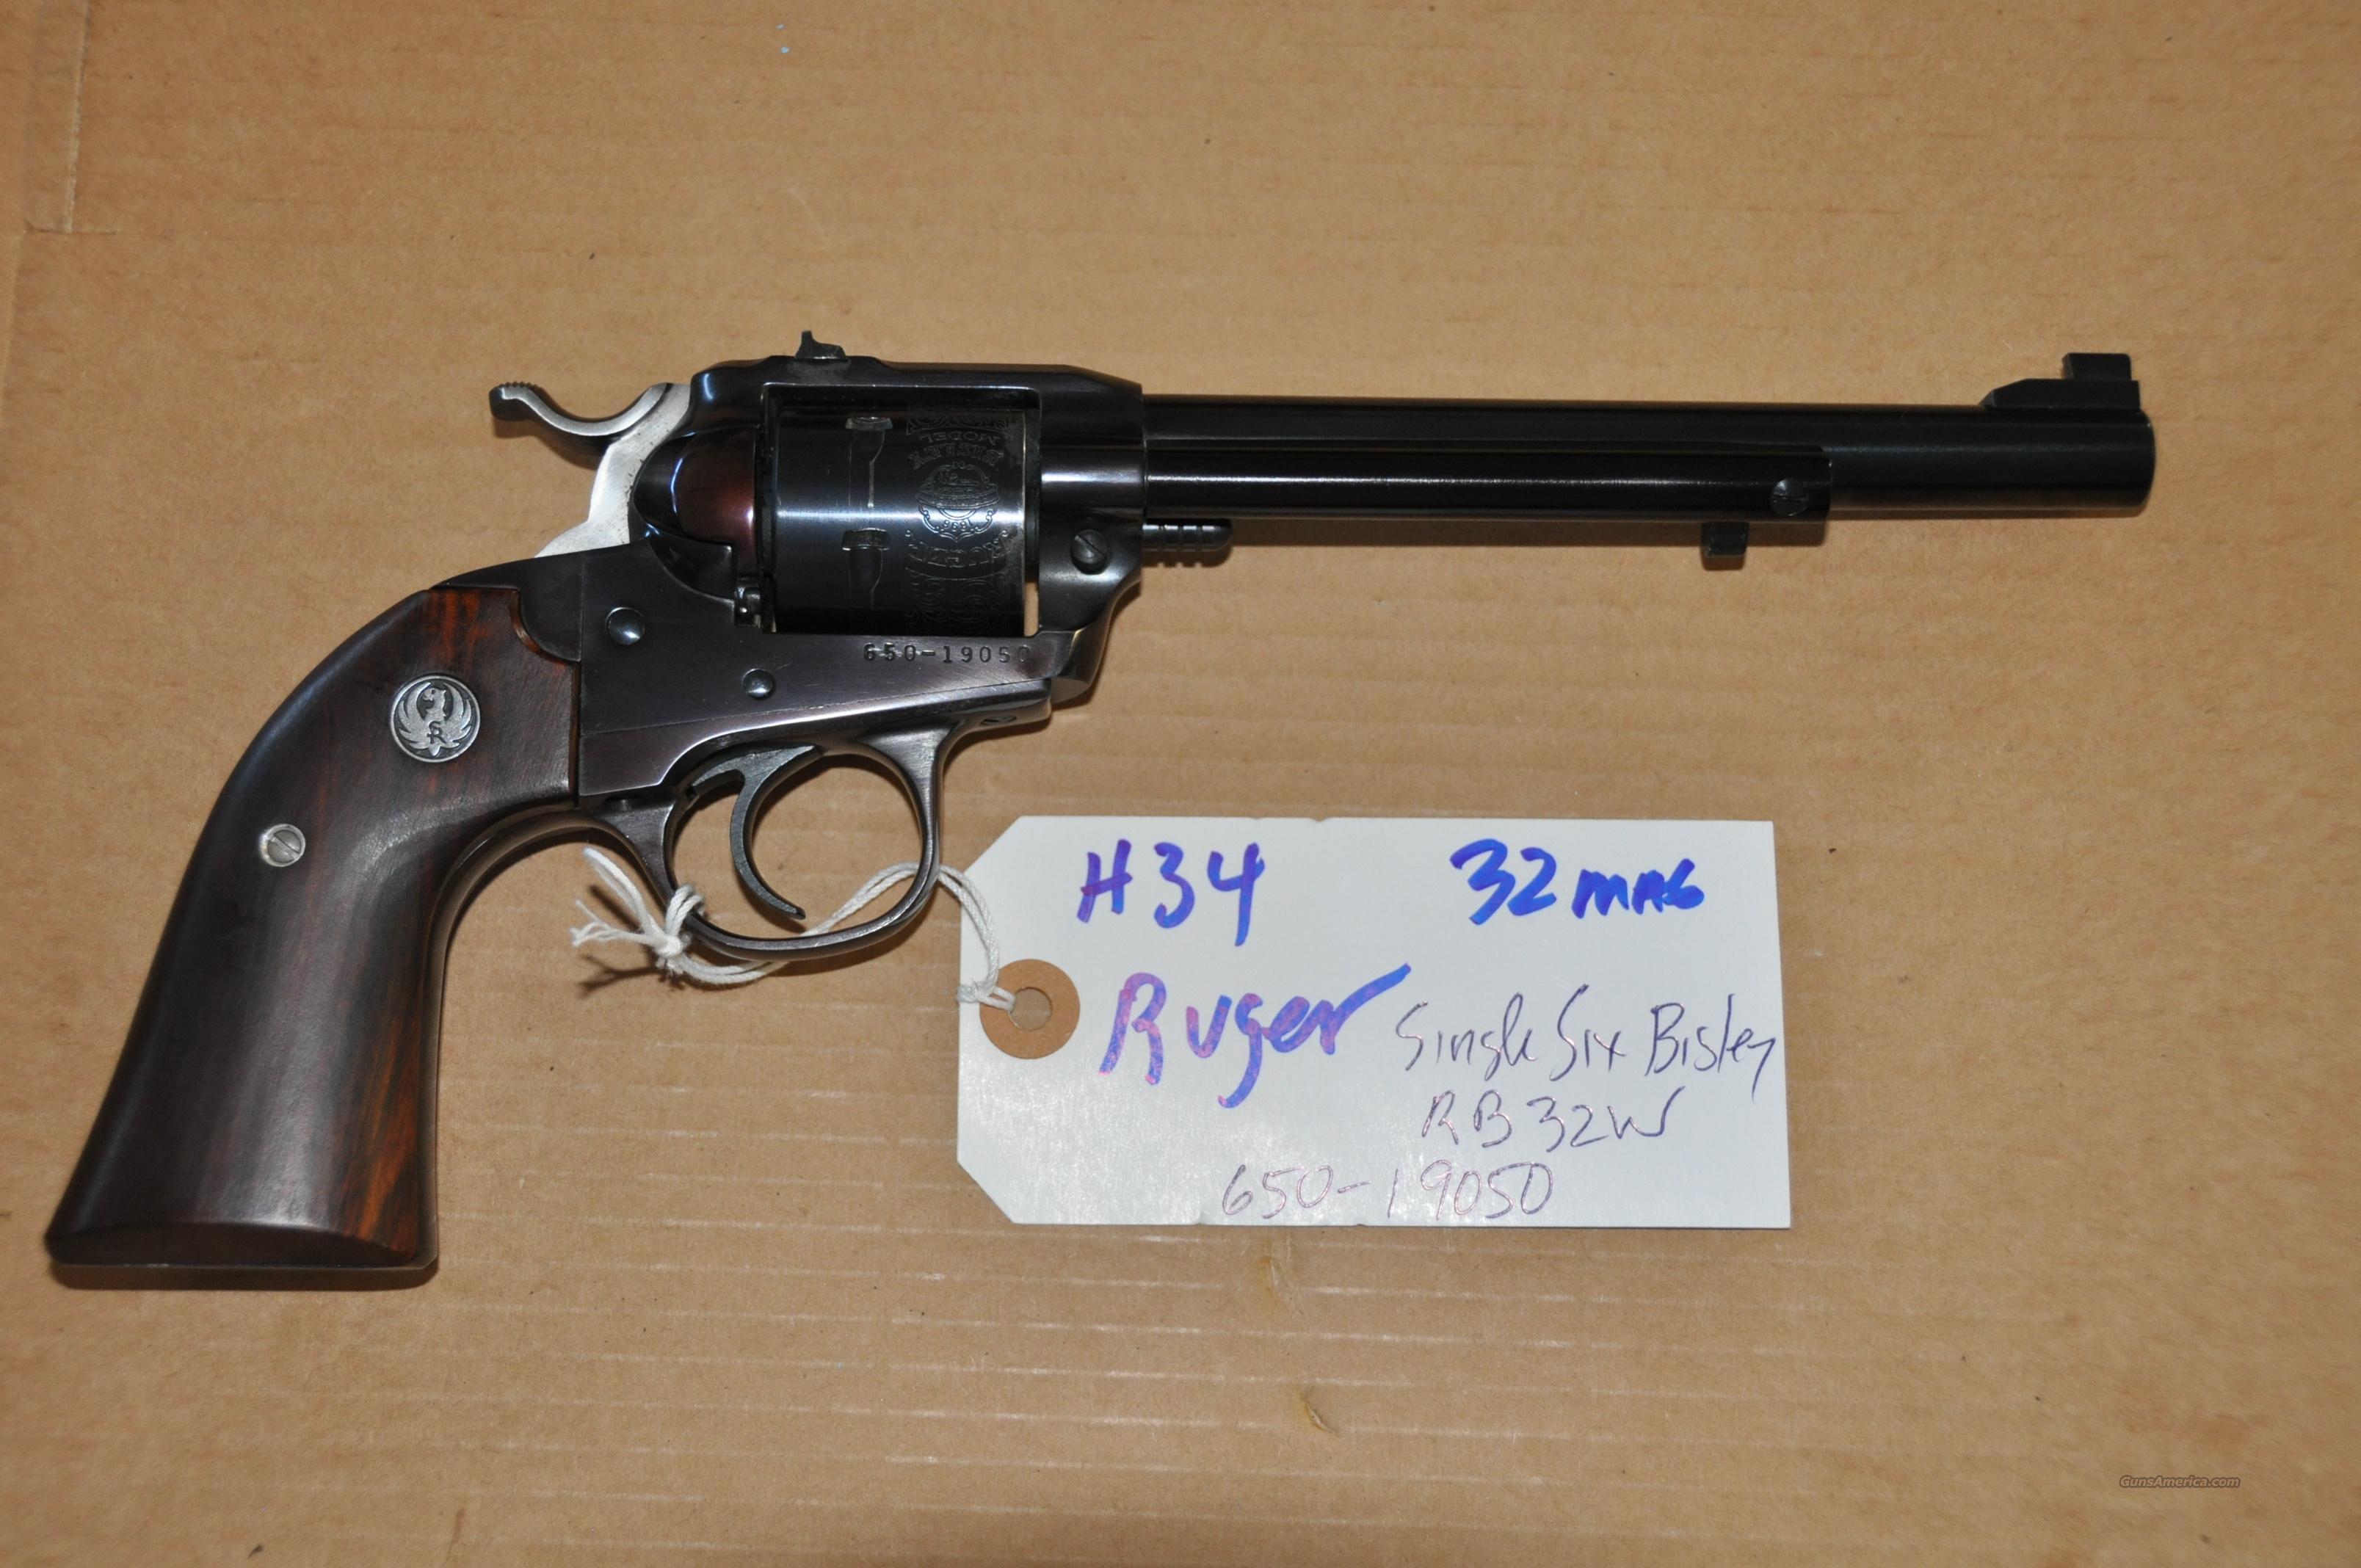 Dating h&r revolvers